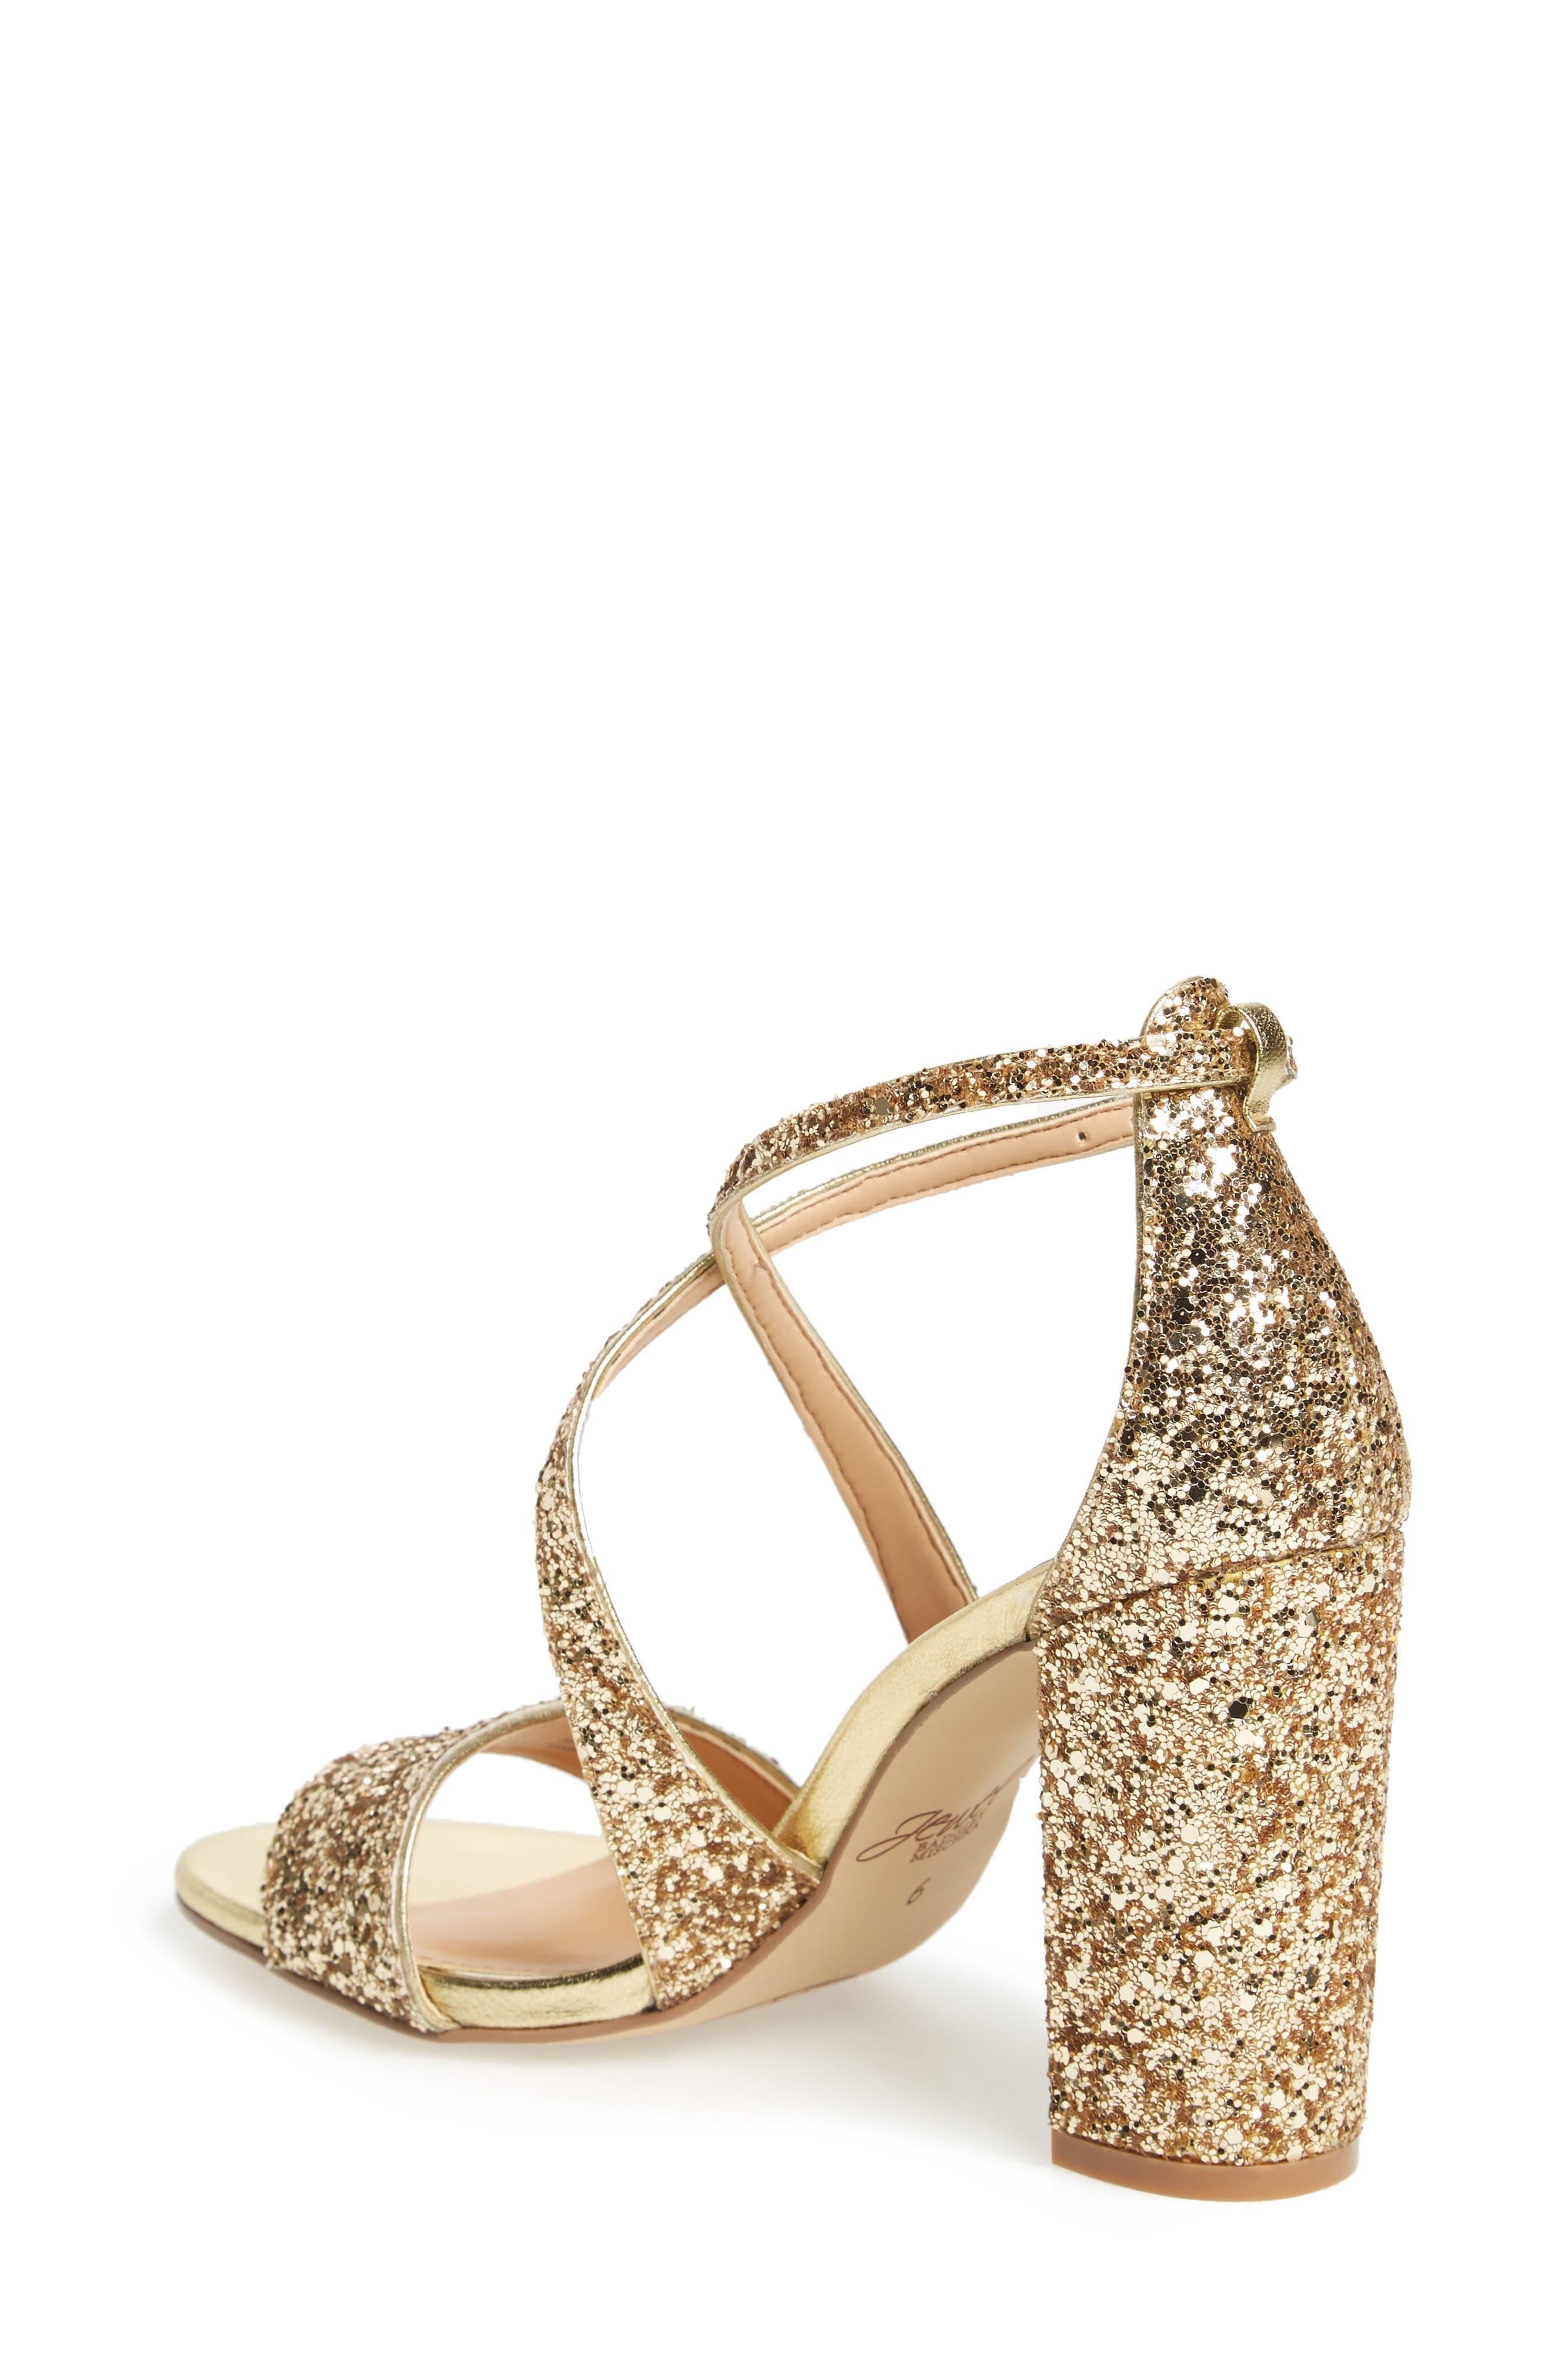 Cook Block Heel Glitter Sandal,                             Alternate thumbnail 2, color,                             GOLD LEATHER